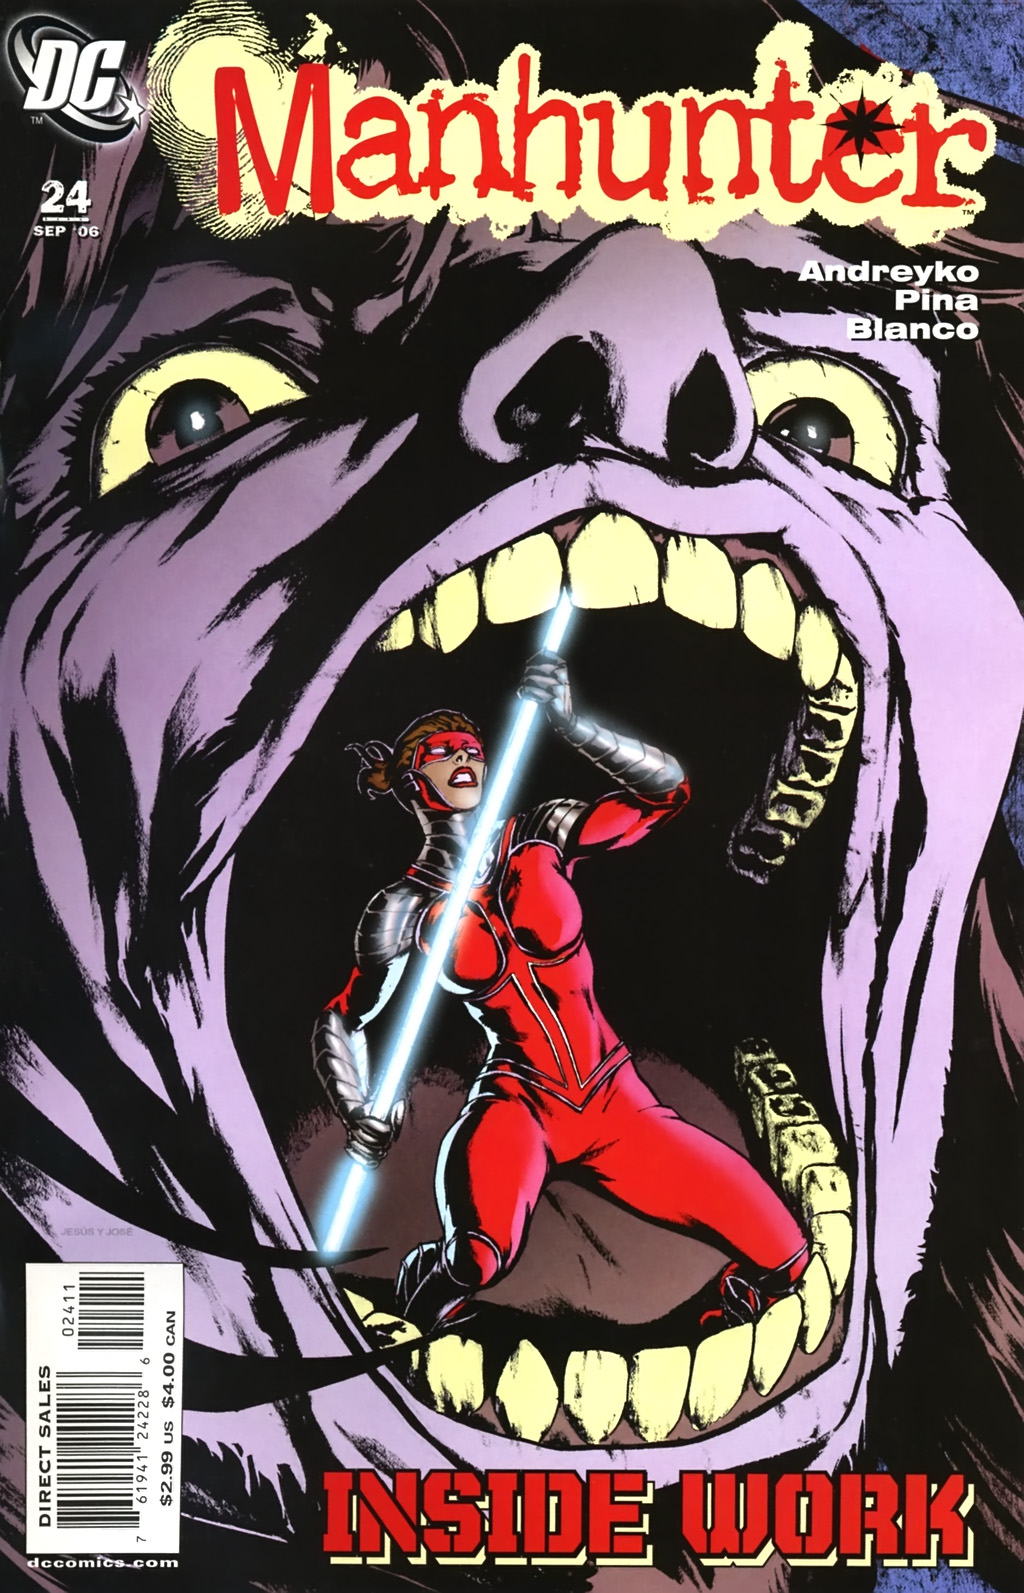 Manhunter (2004) issue 24 - Page 1